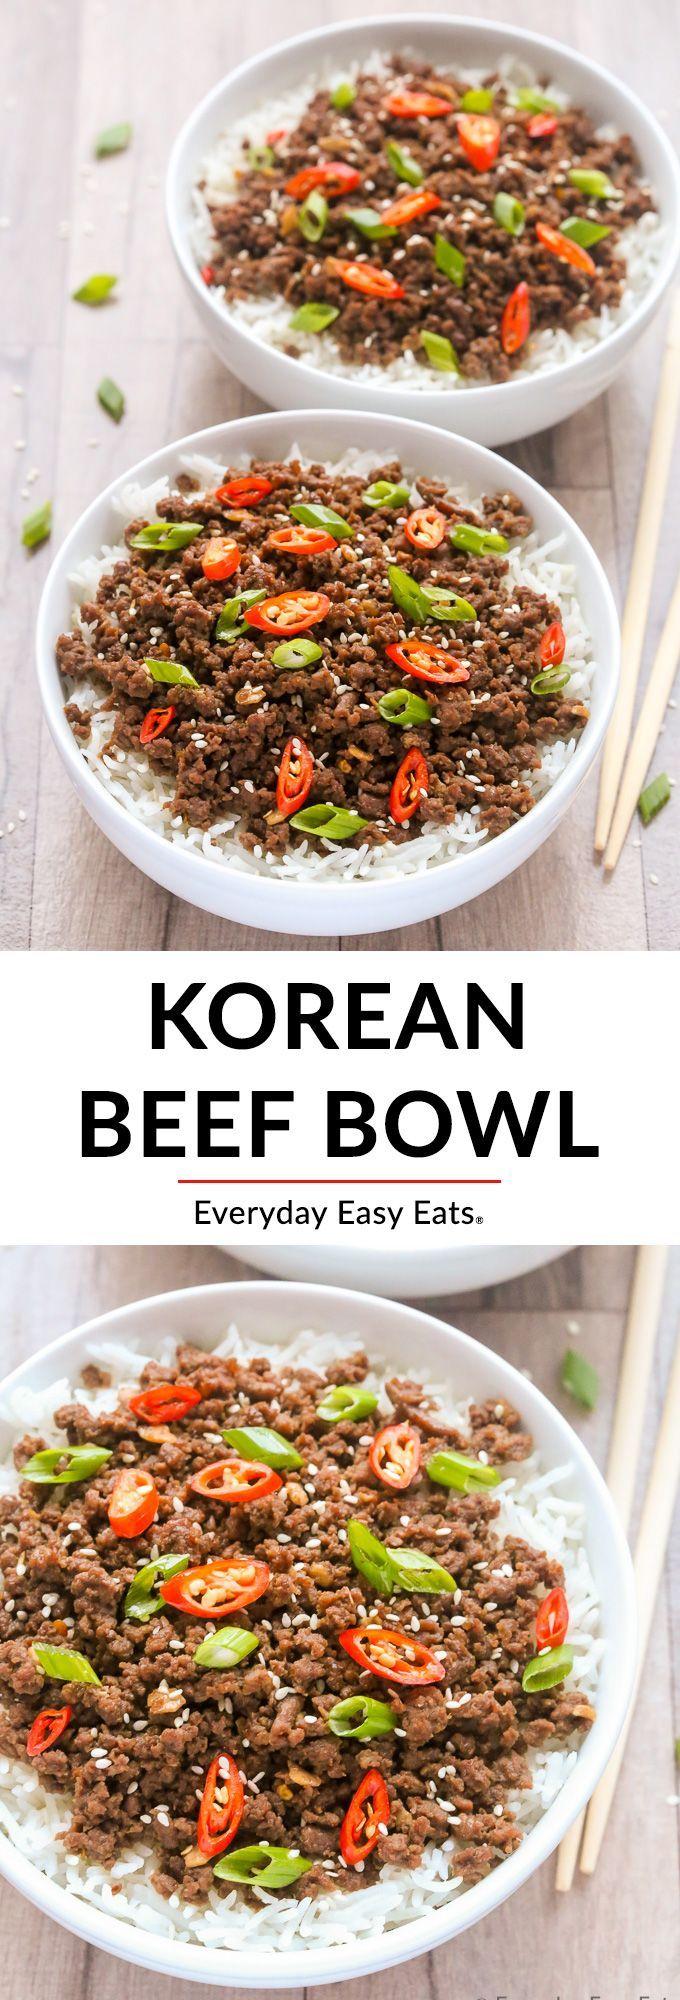 Korean Beef Bowls images